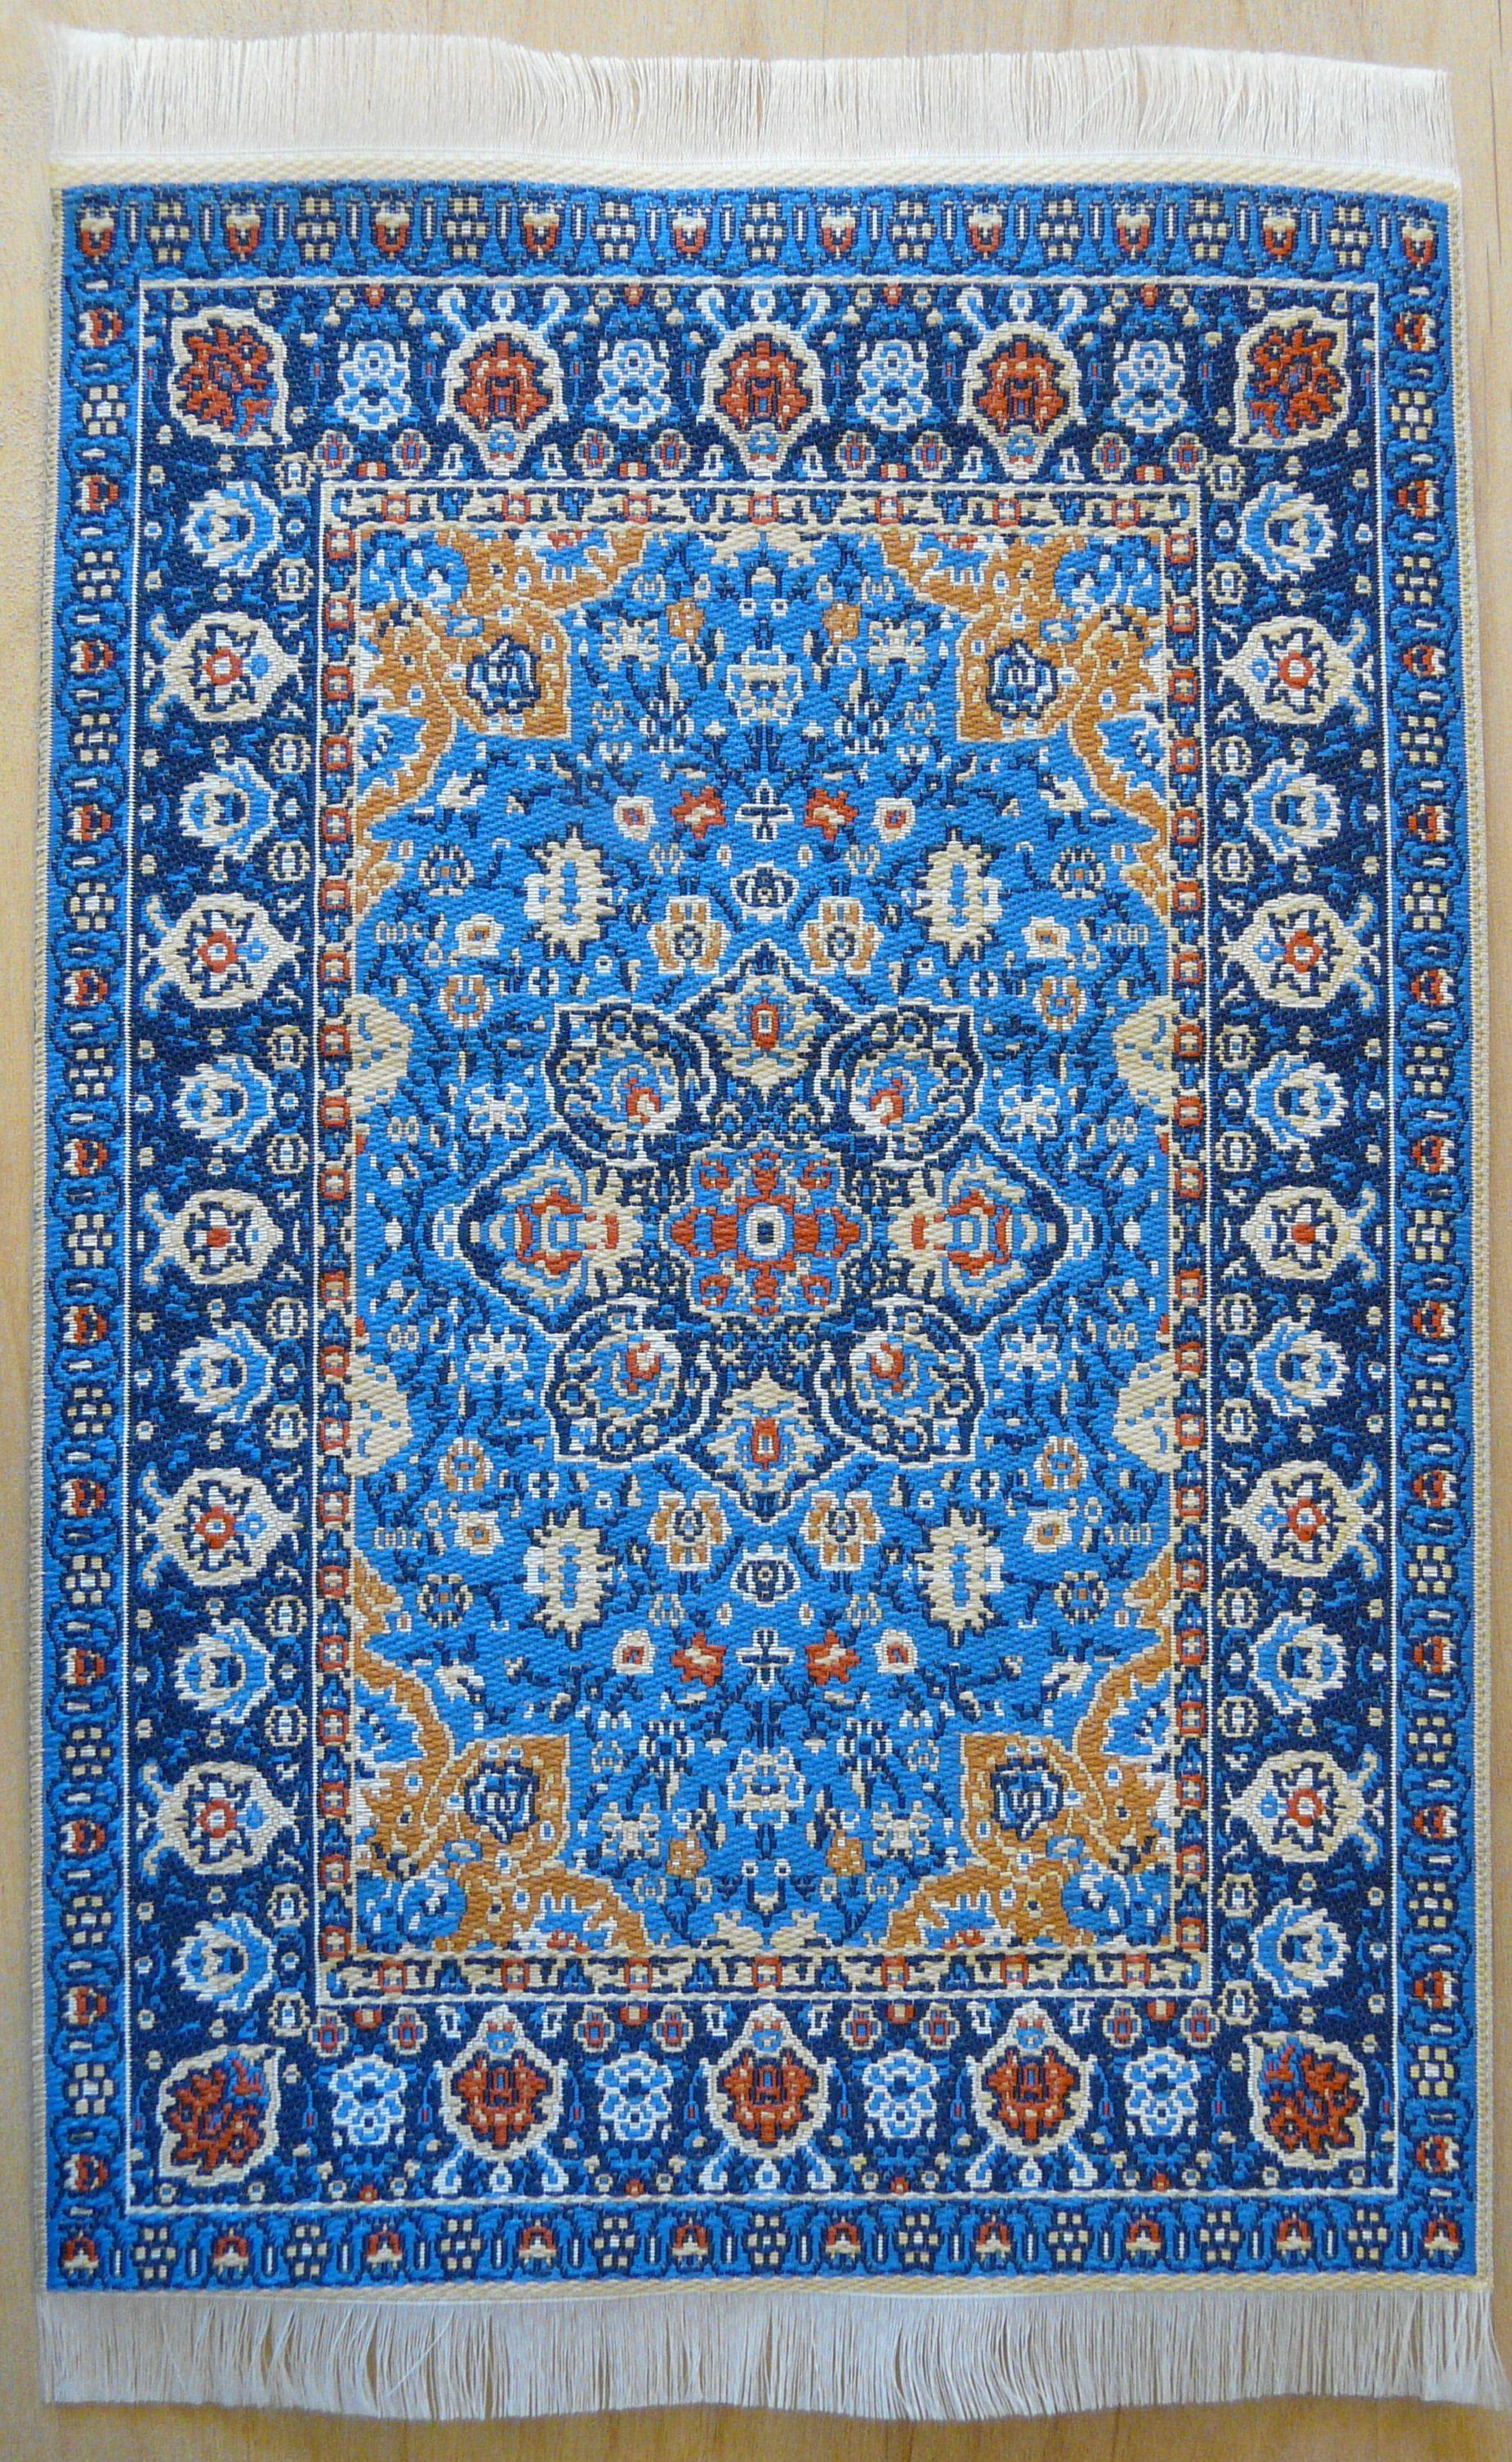 blue turkish rug w/persian influence in design UGYUJBI